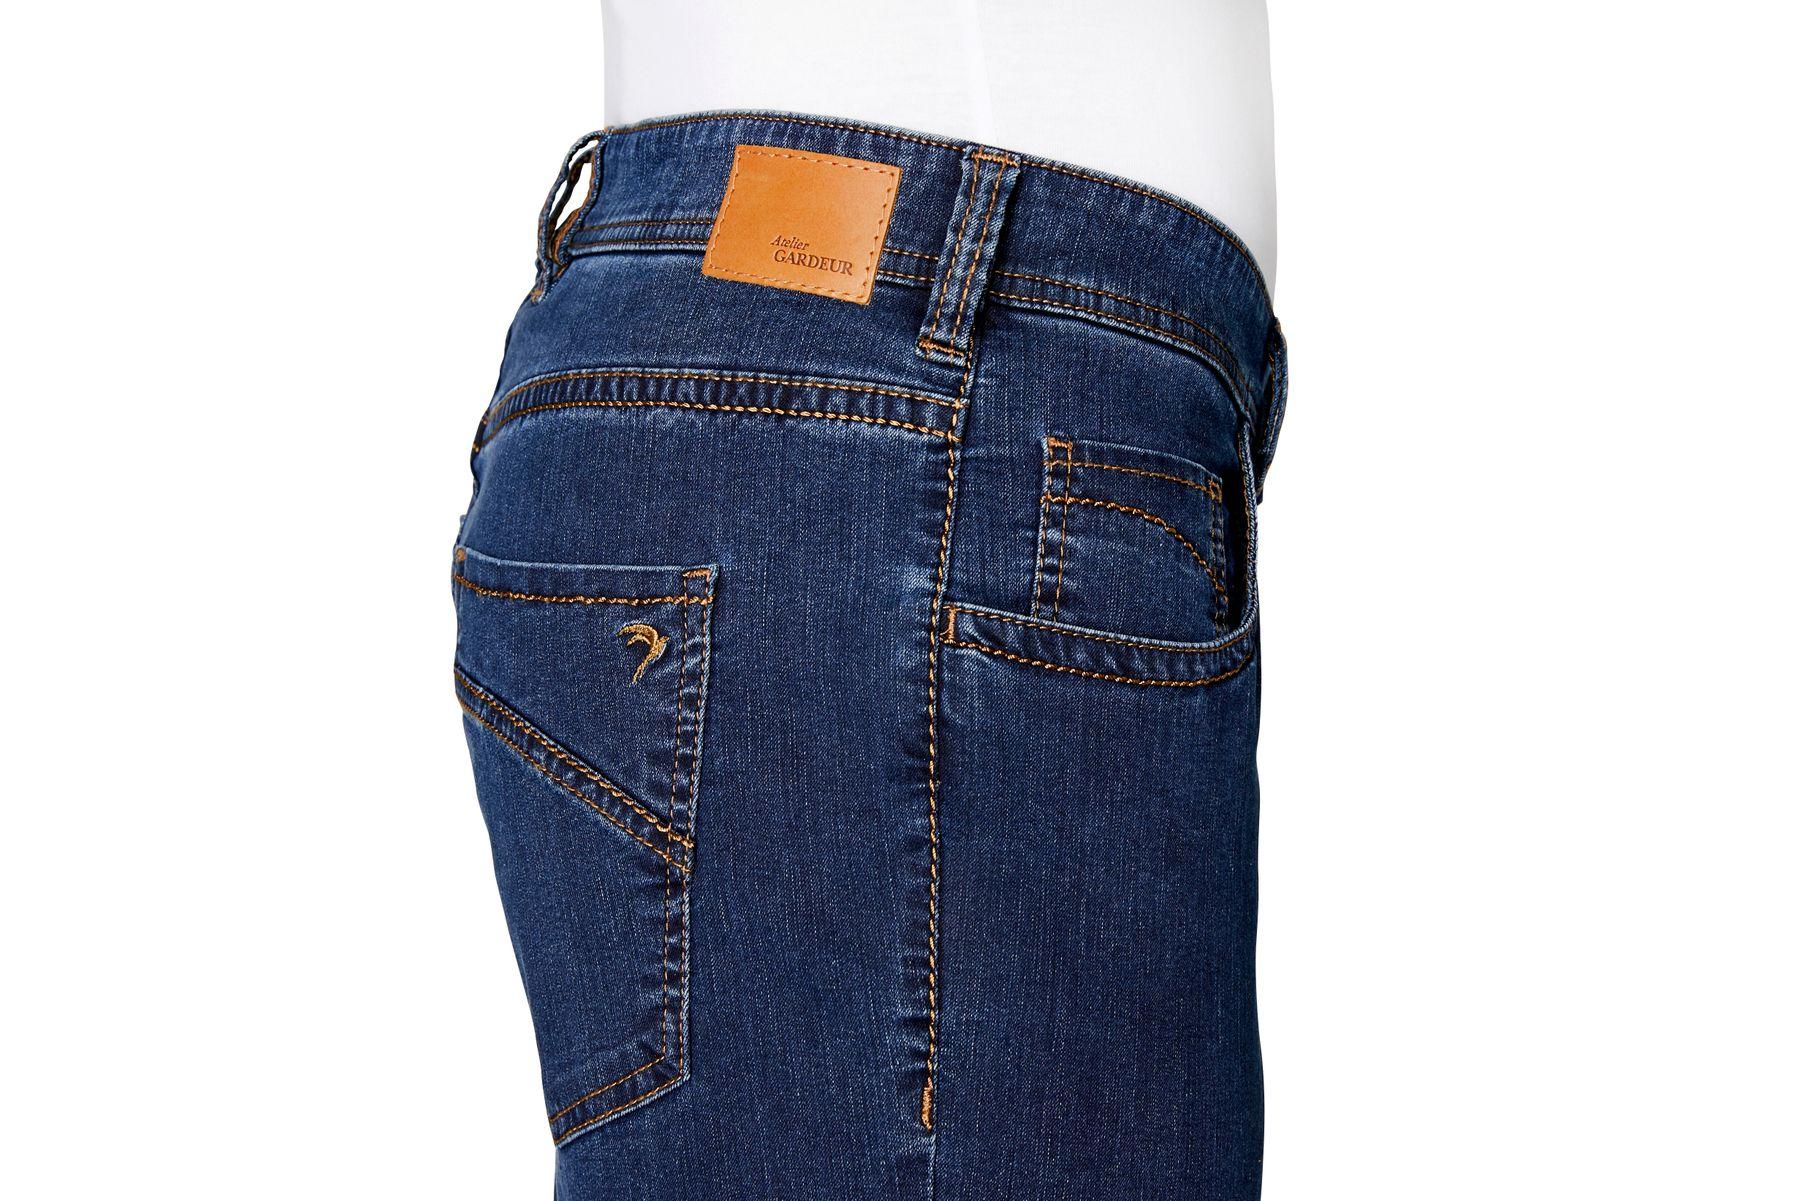 Atelier Gardeur - Herren 5-Pocket Jeans Modern Fit, Bill-19 (470621) – Bild 8